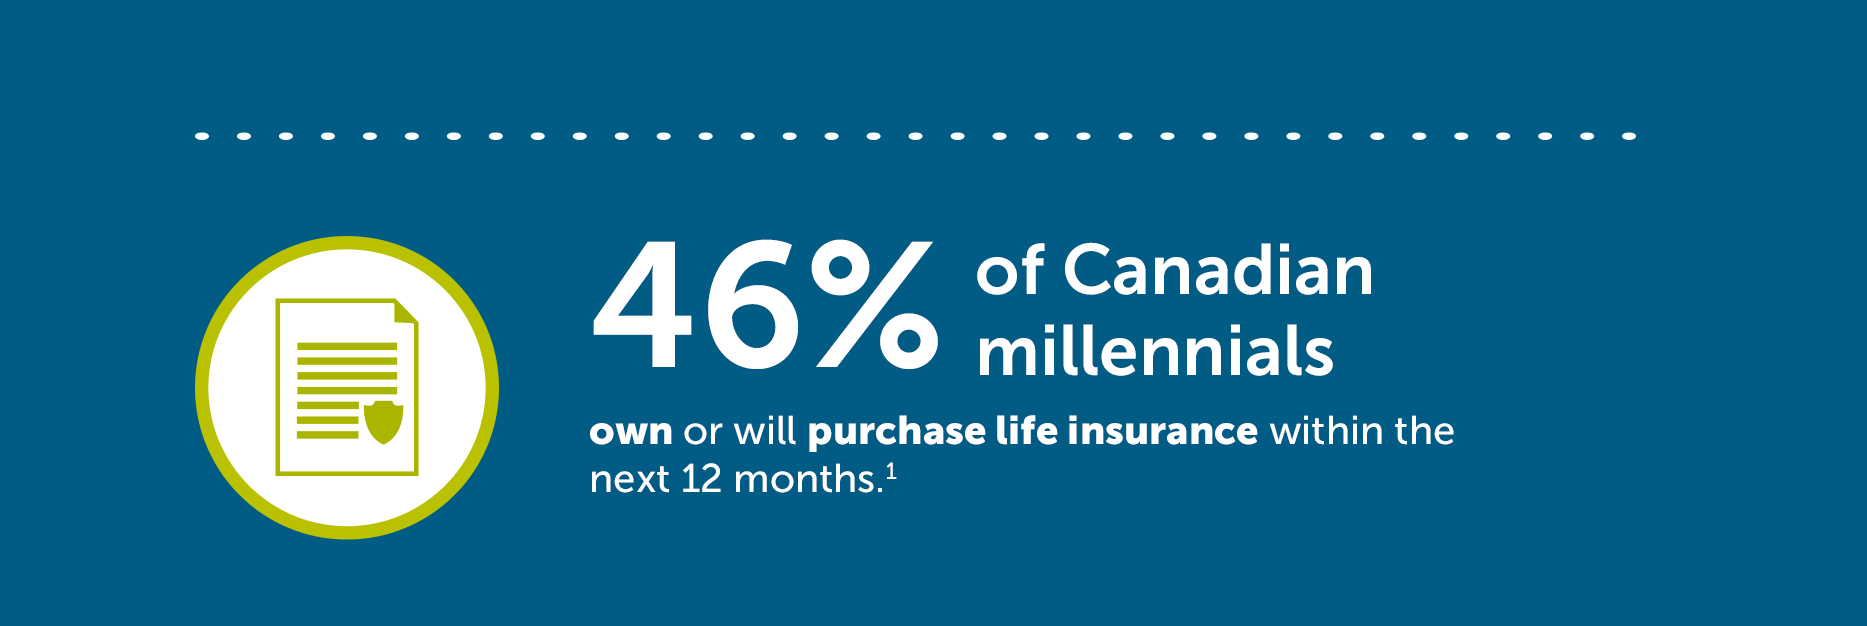 Millennial Life Insurance Statistic 1